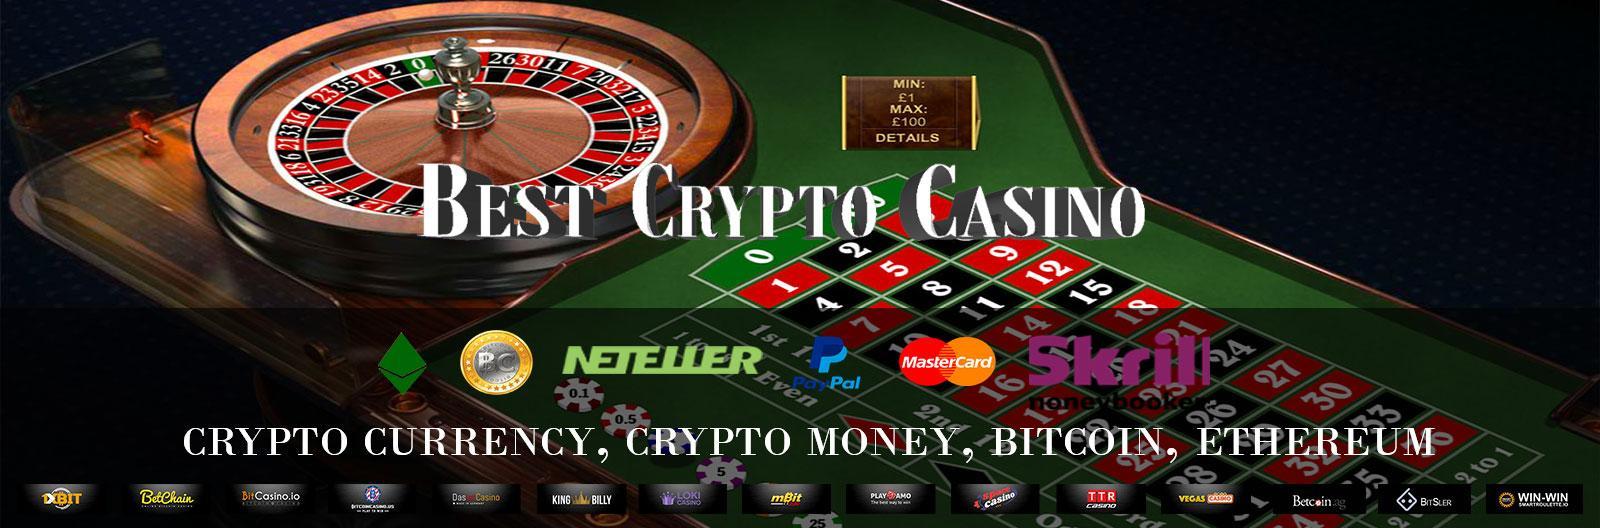 Online bitcoin casino Krone